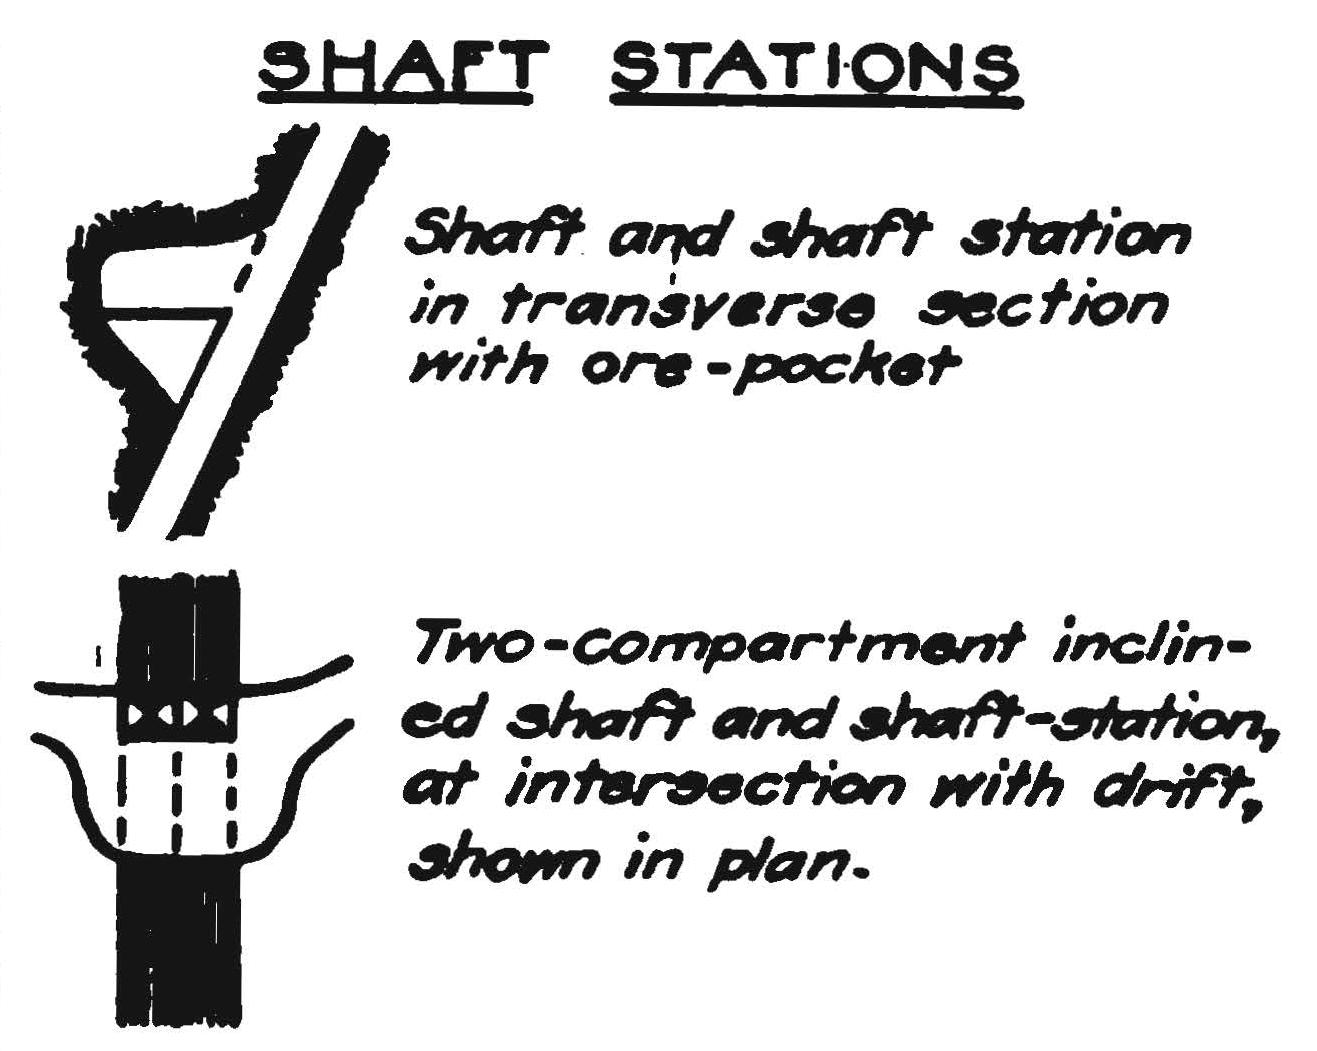 Mining map symbols map symbols mining making maps diy shaftstations buycottarizona Image collections